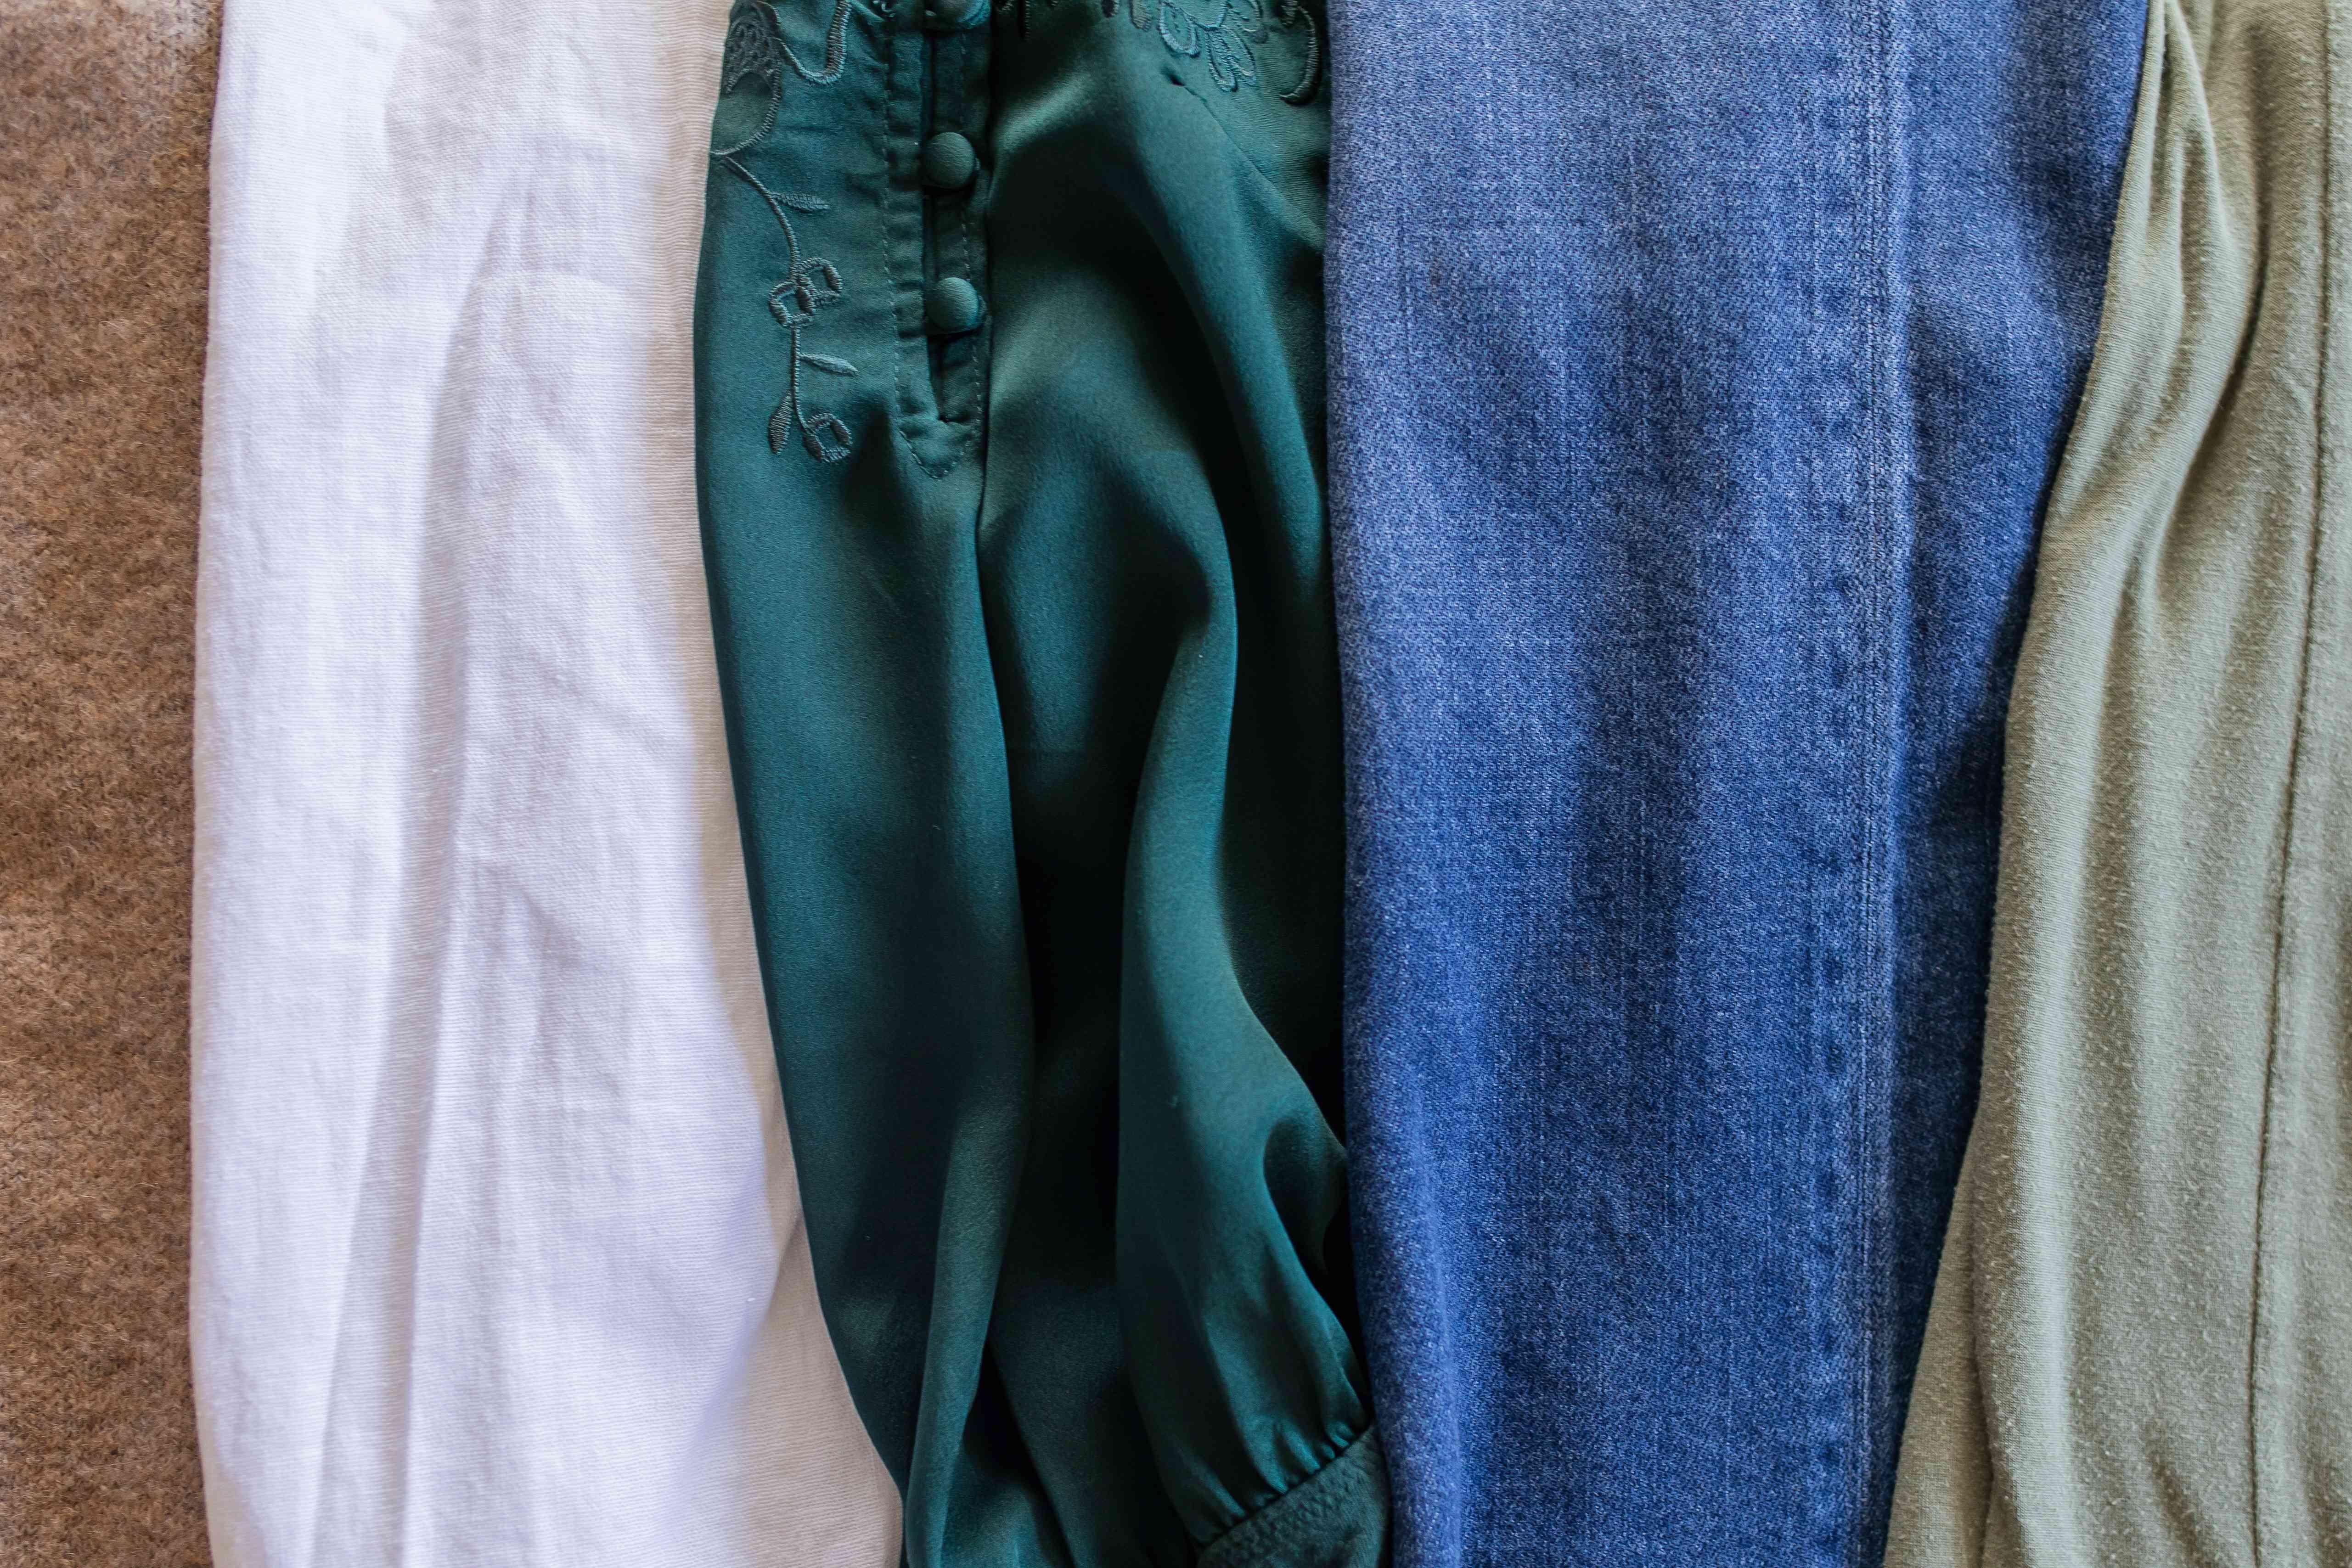 different types of fabrics